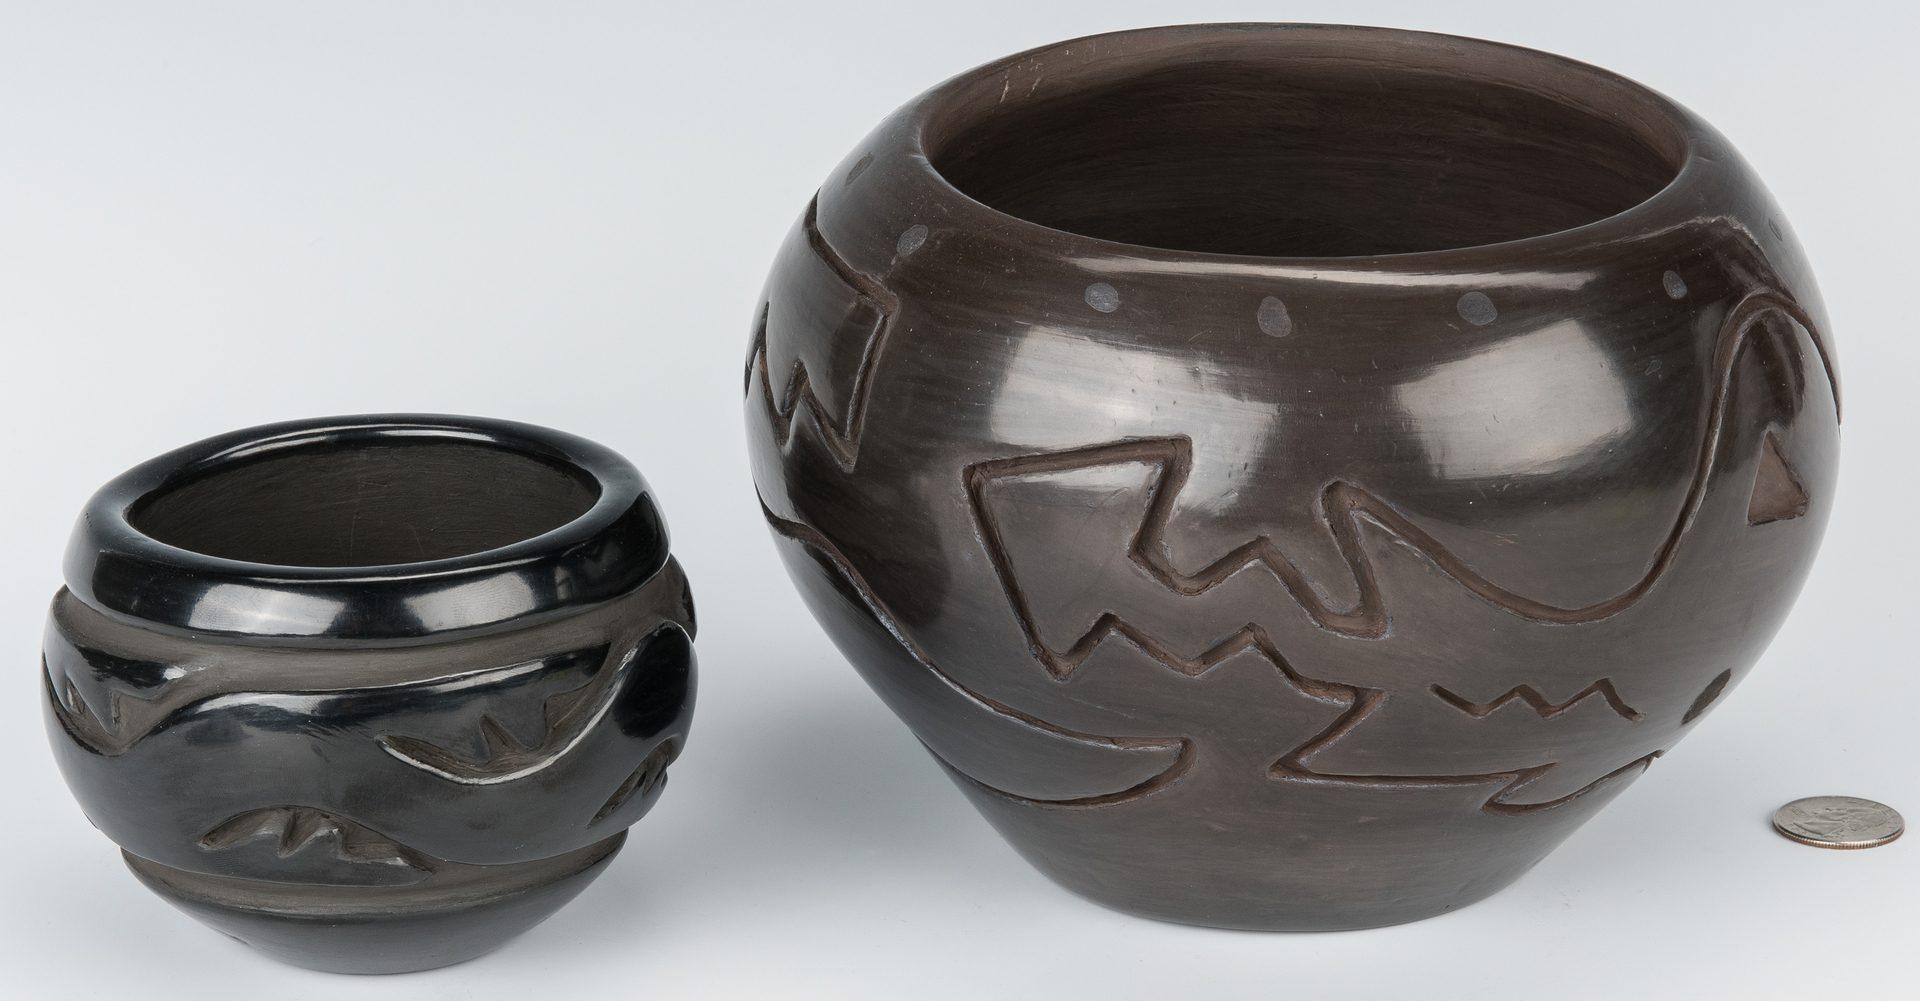 Lot 602: 3 Pueblo Pottery items, incl. Carmelita Dunlap, Elizabeth Naranjo